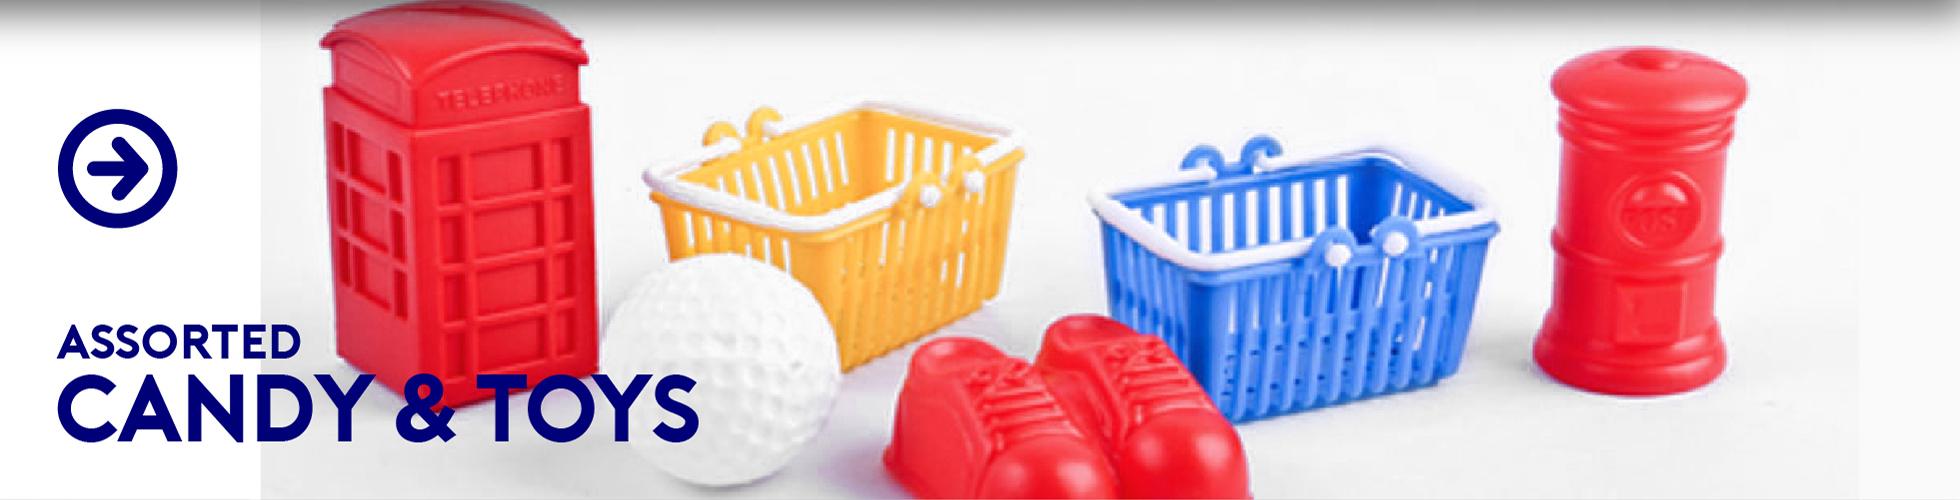 Products Sri Poma Plastic Ind Sdn Bhd Botol Plastik Ps 250 Contact Us